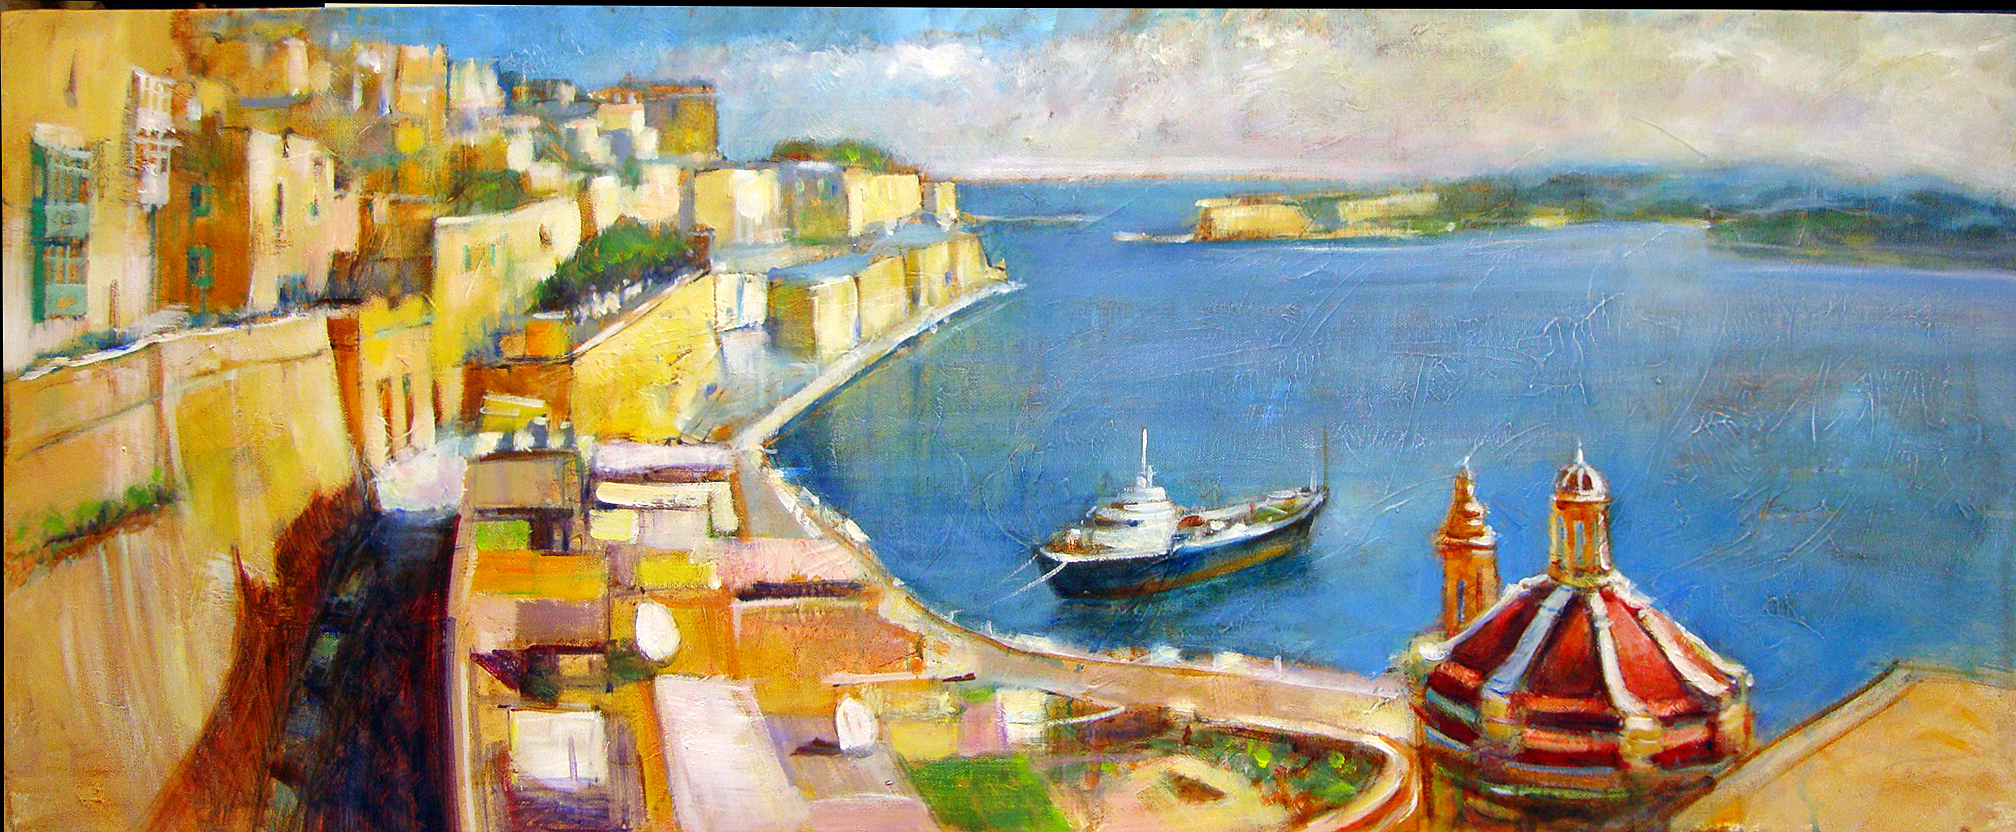 C.S.Lawrence paintings of Malta | Paint Malta